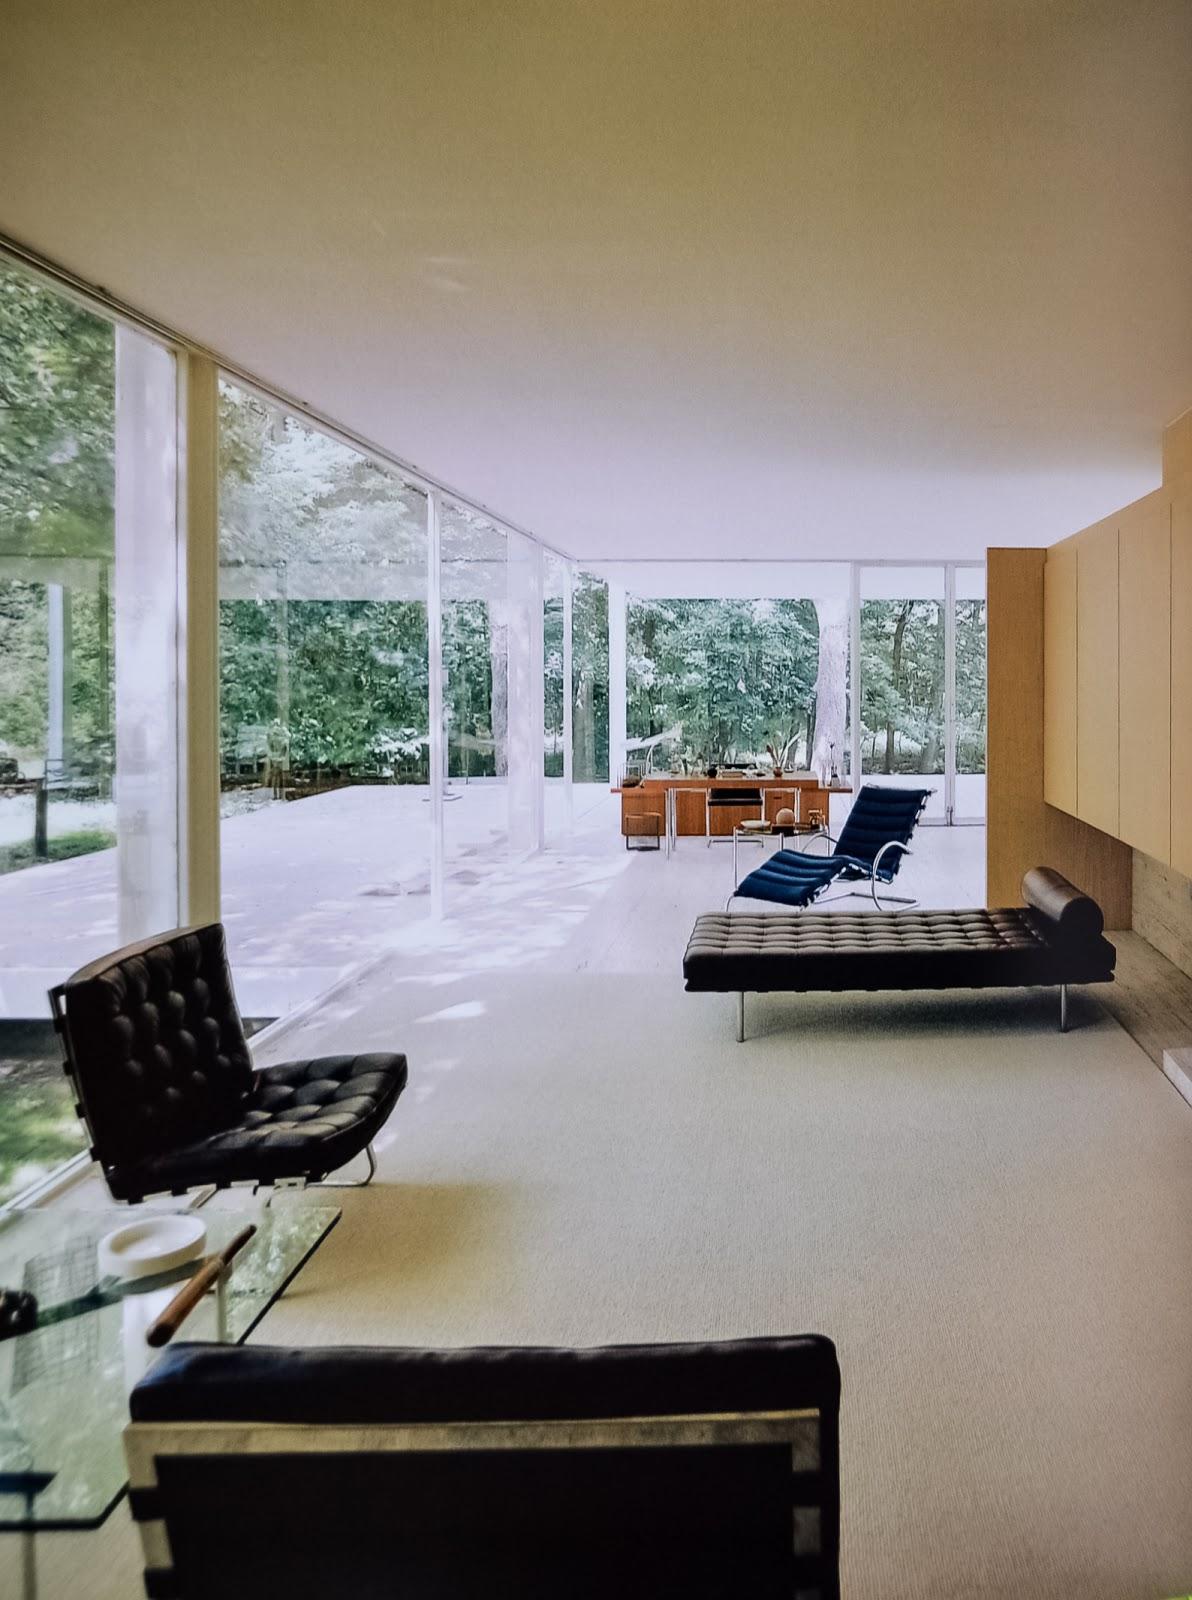 Corners of the 20th century mies van der rohe 1886 1969 - Casa farnsworth ...